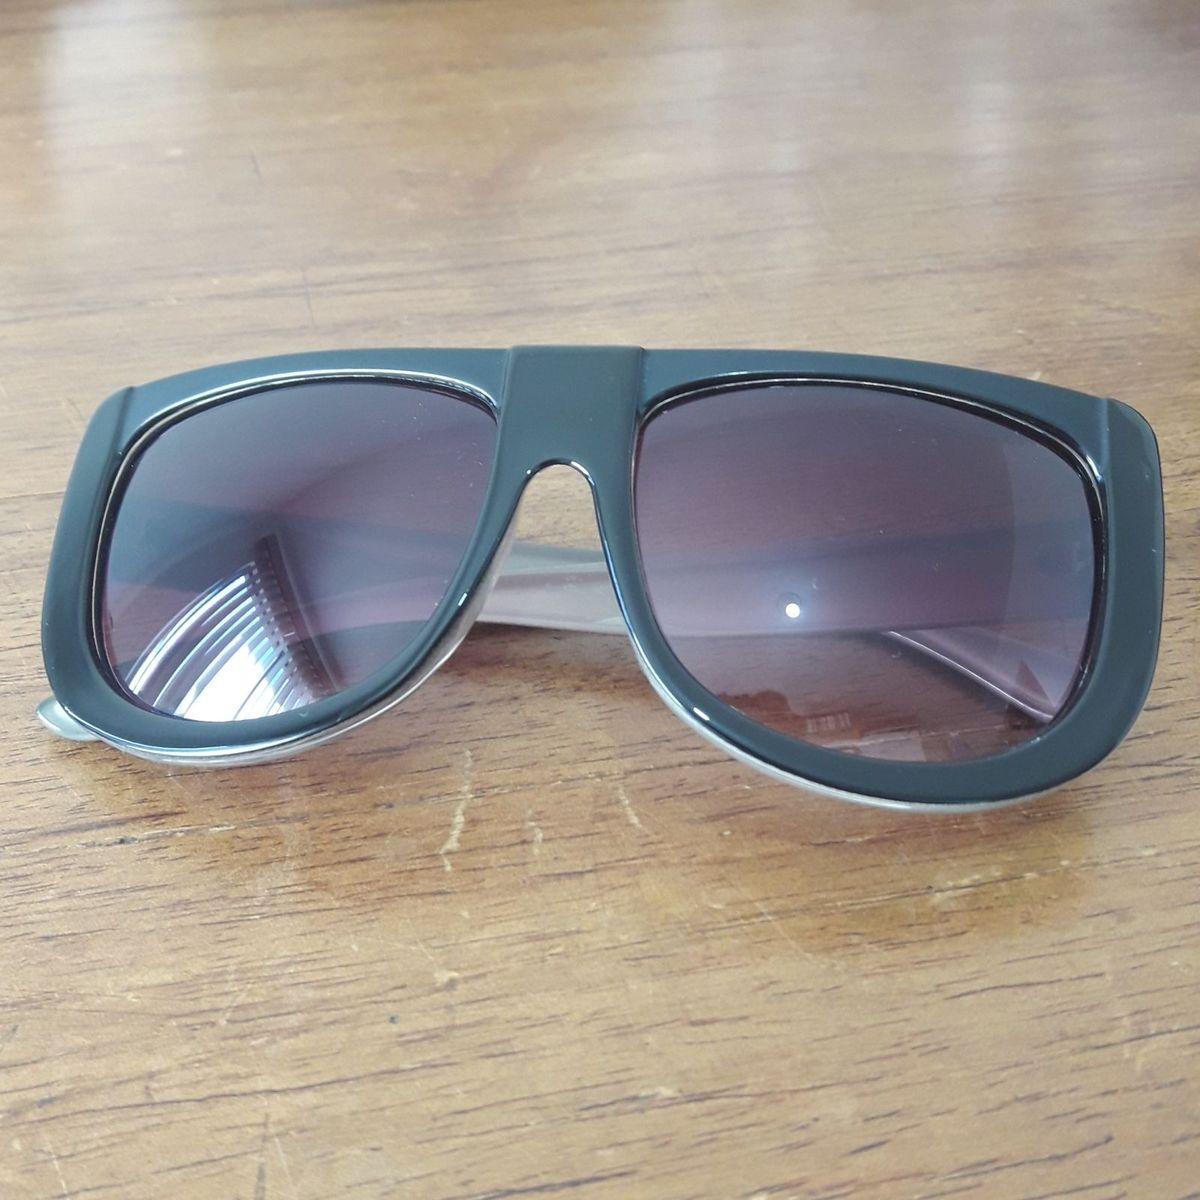 71c6efecc6bed Óculos Estiloso - Unissex